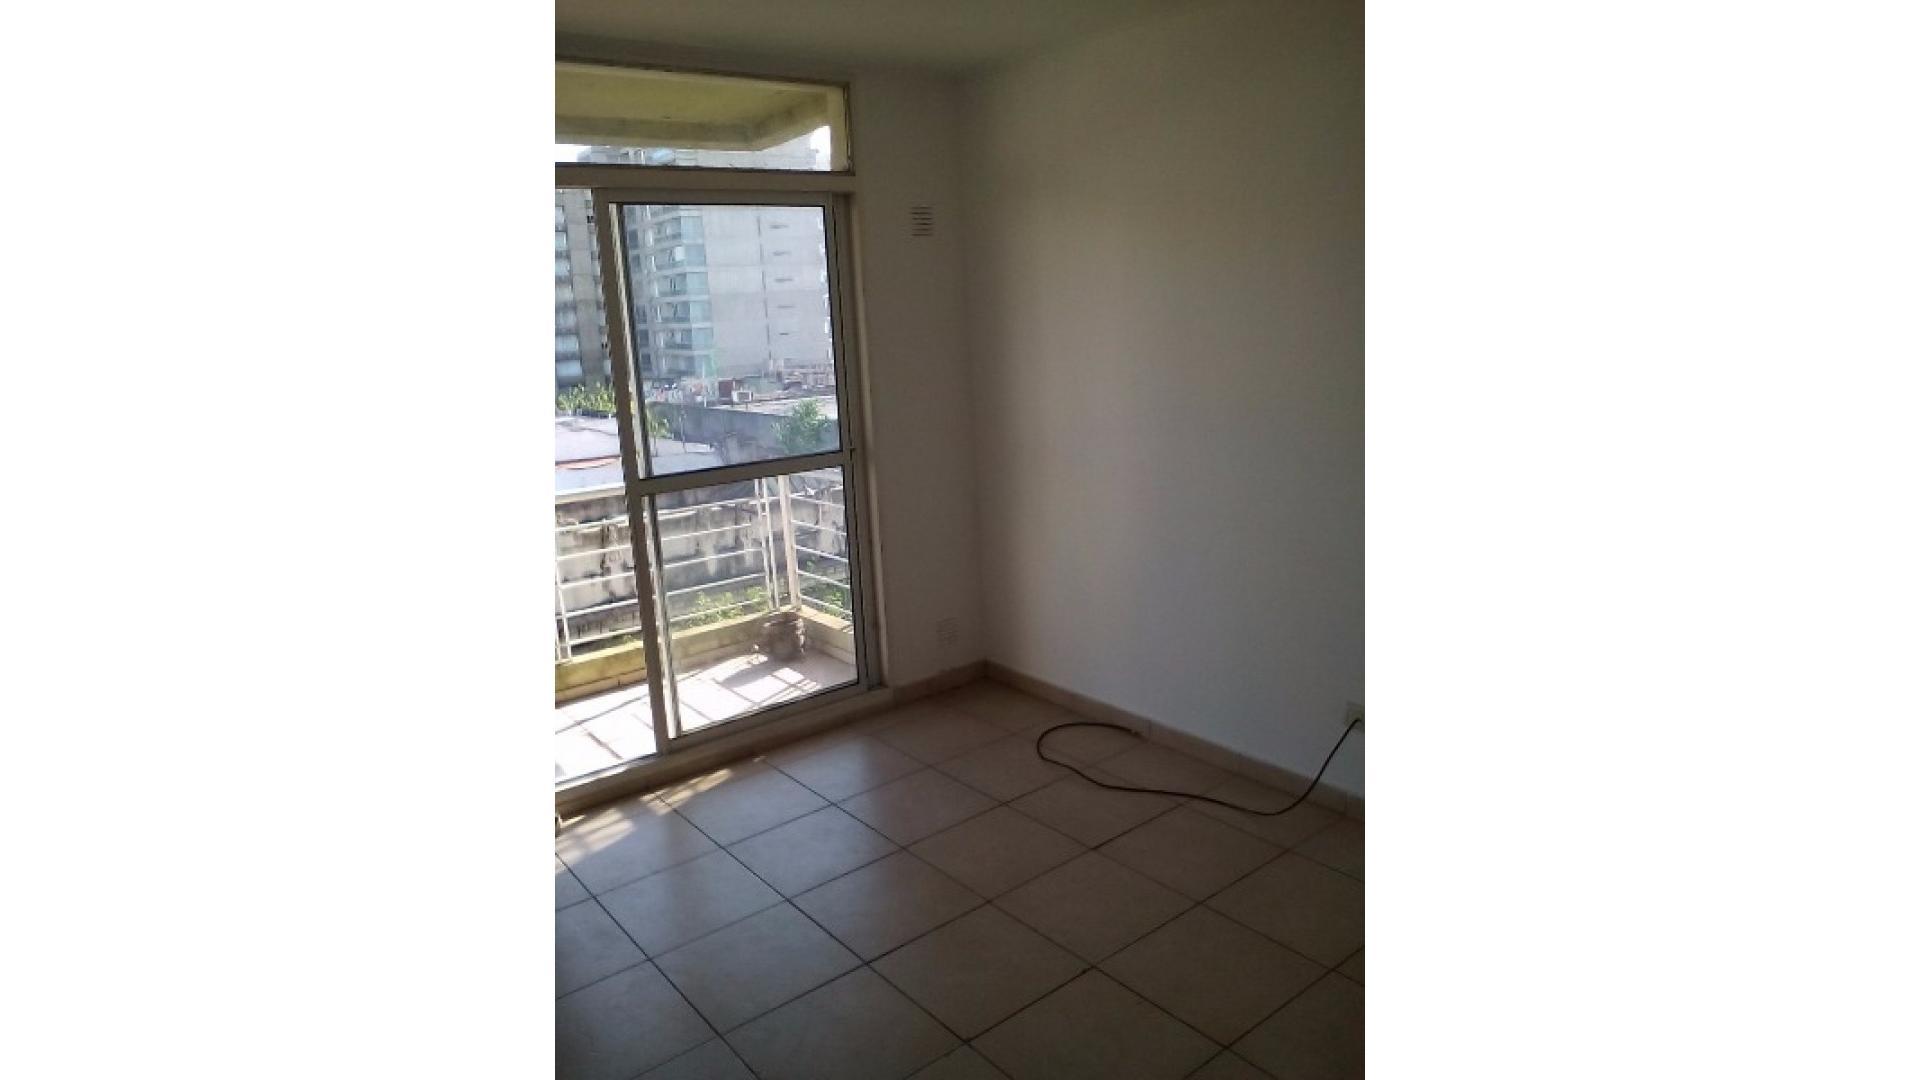 Alquiler Departamento de 1 Dormitorio con Balcón